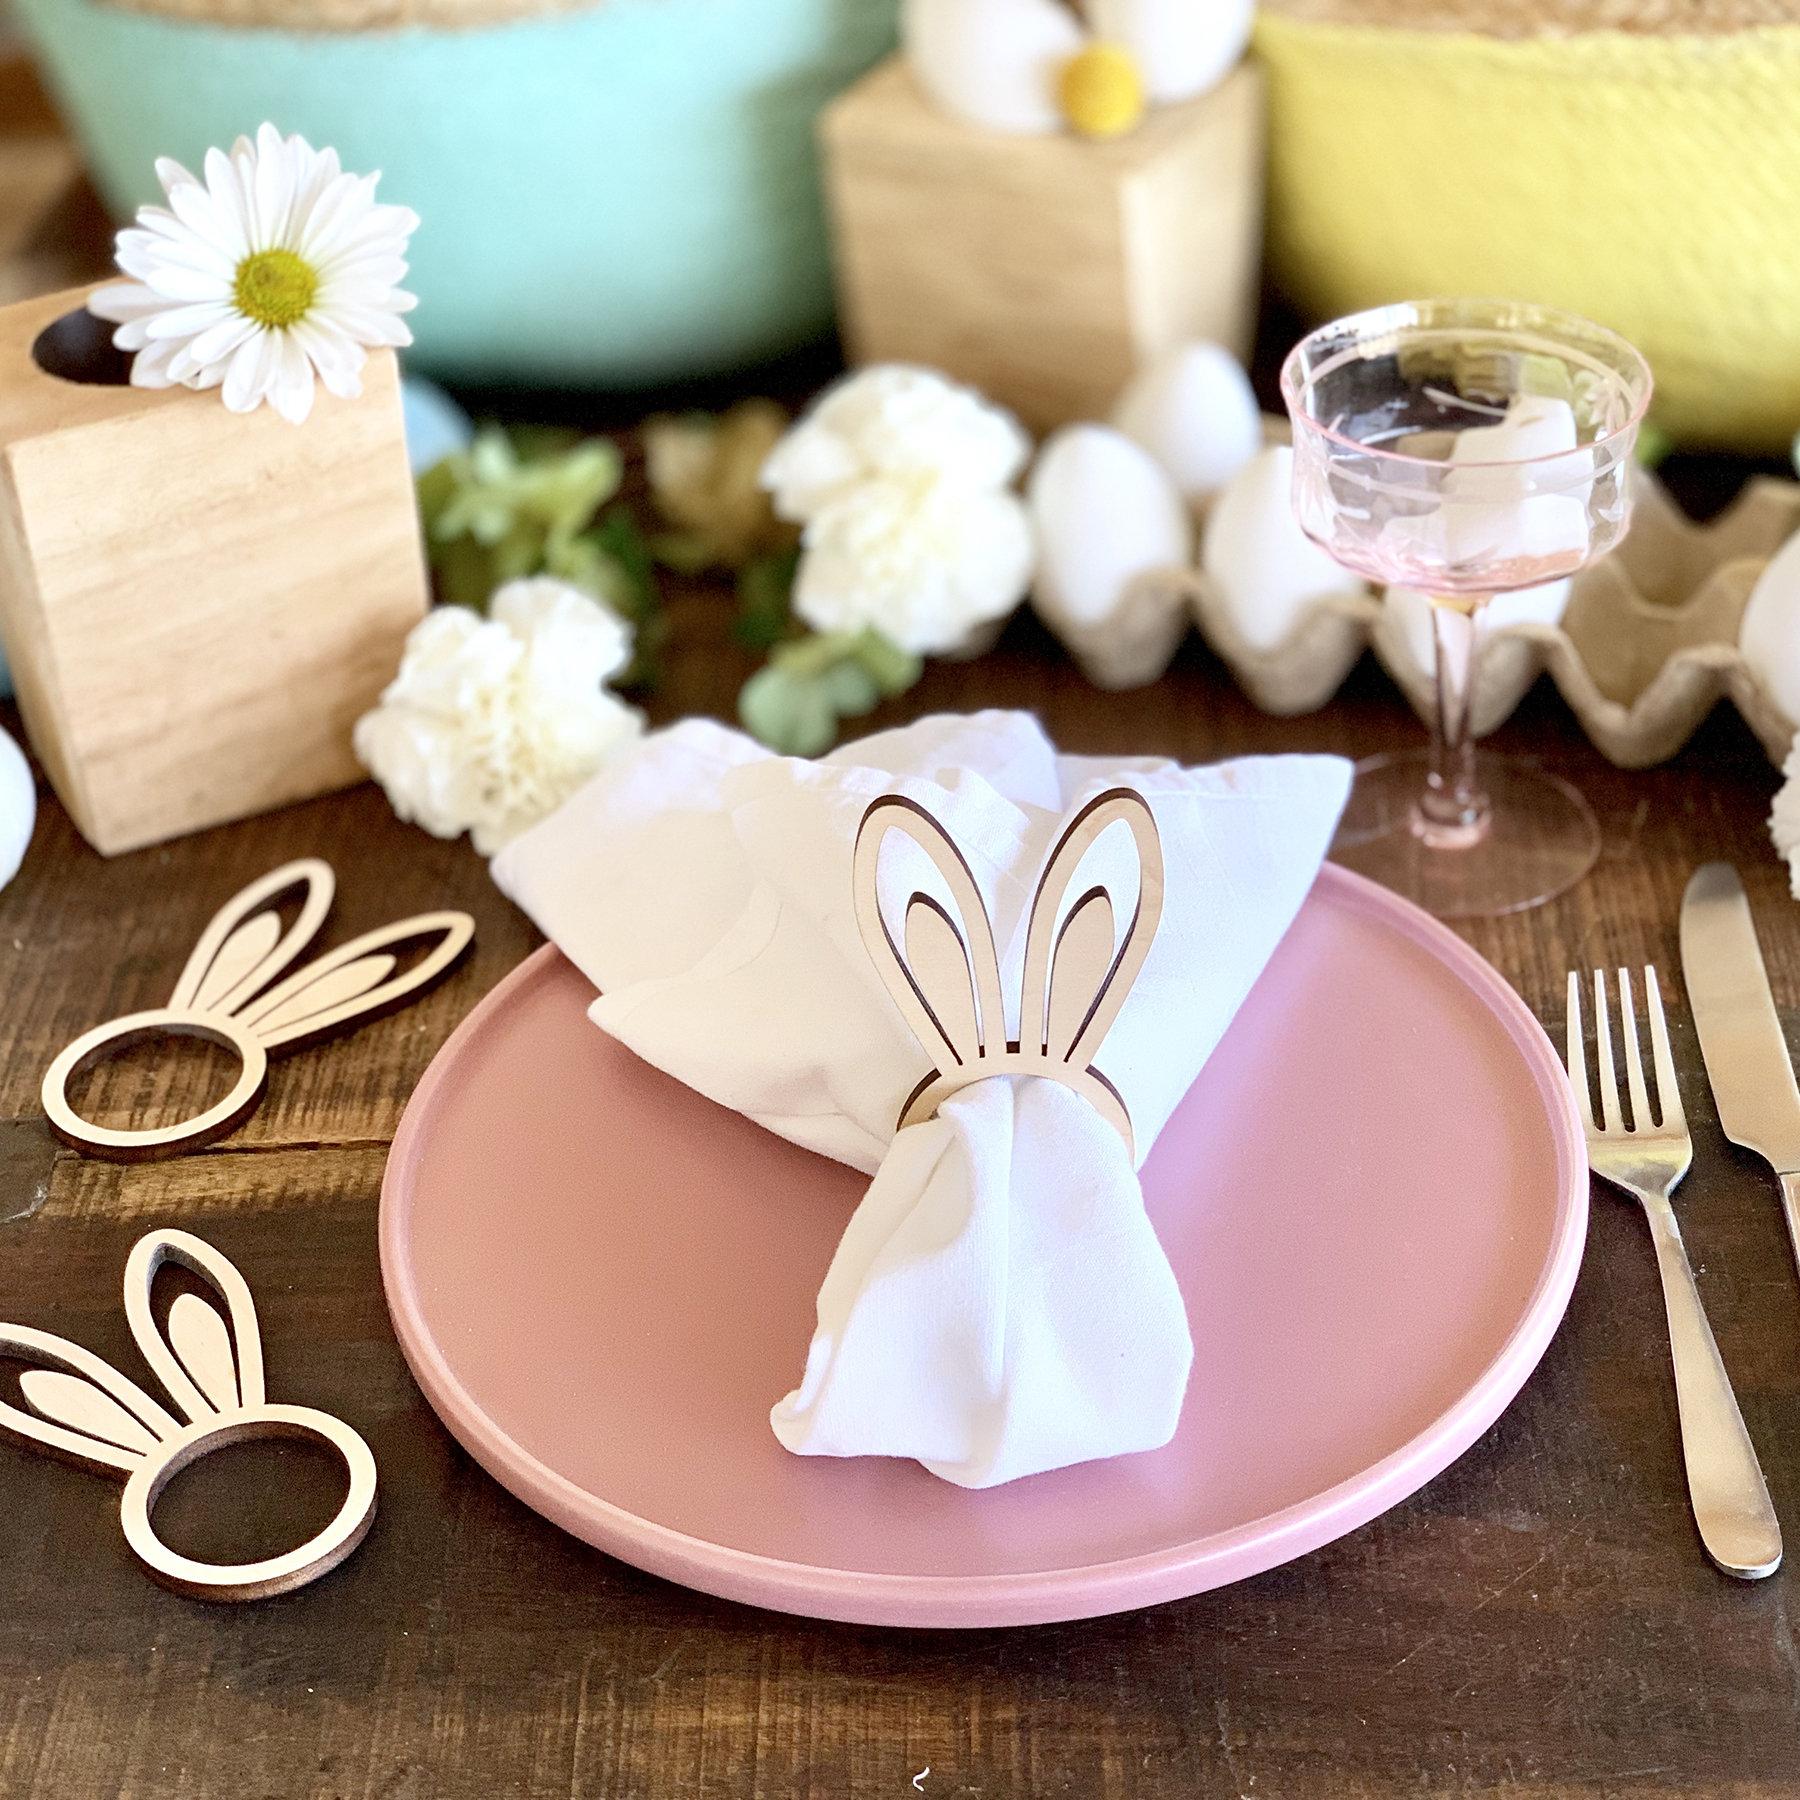 Bunny Ears Nakin Ring - Set of 6 Wood